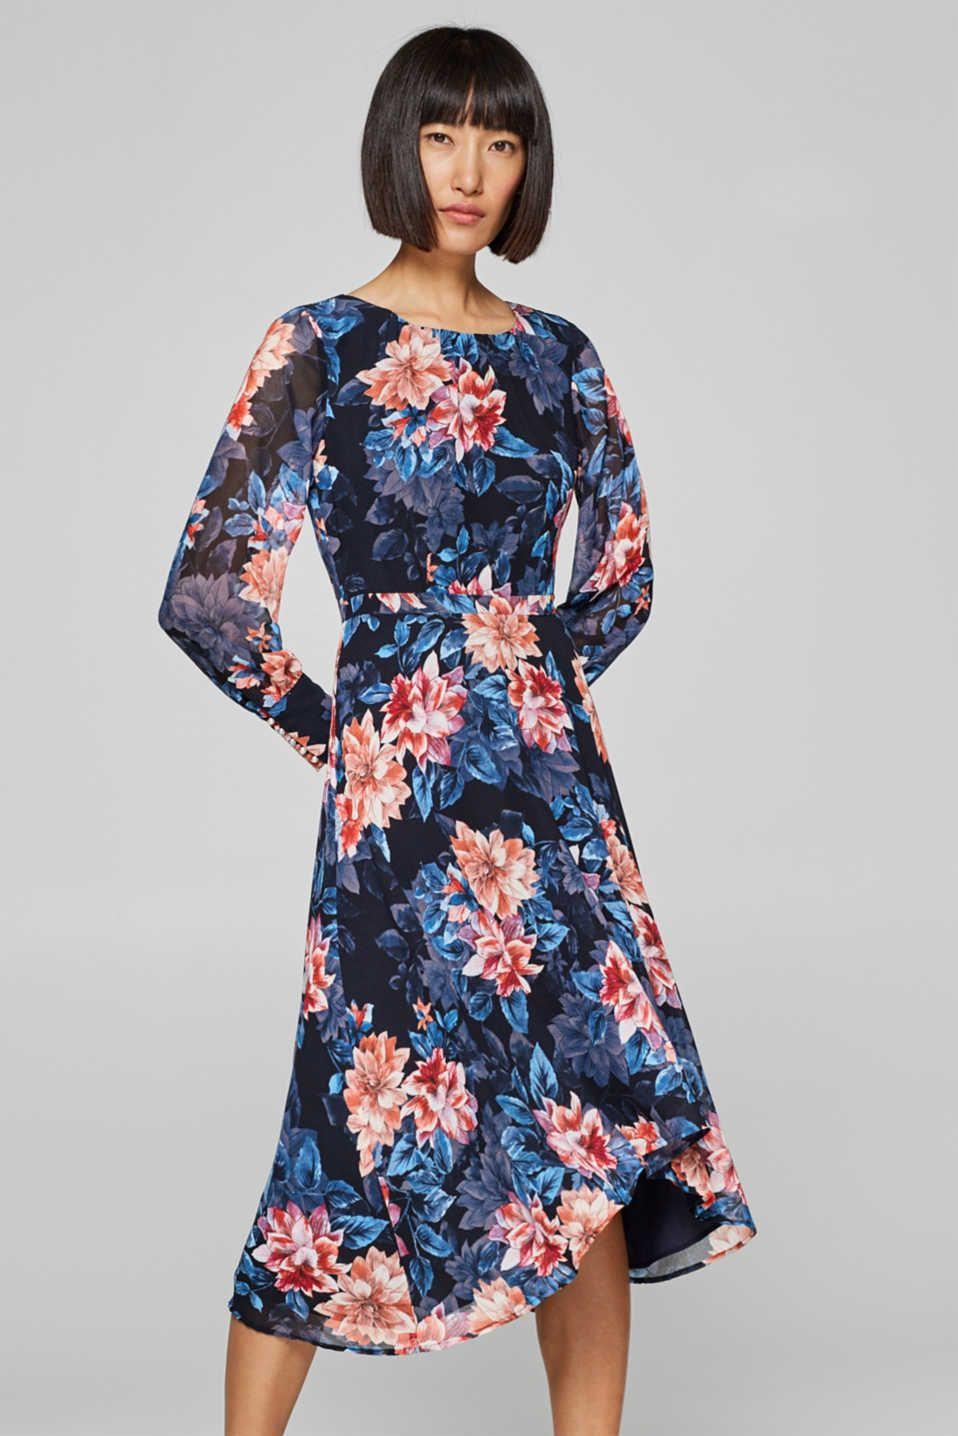 78130ea0 I Fashion Midi Kjole amp; Fint Style Chiffon Esprit Clothes Eqnw7446